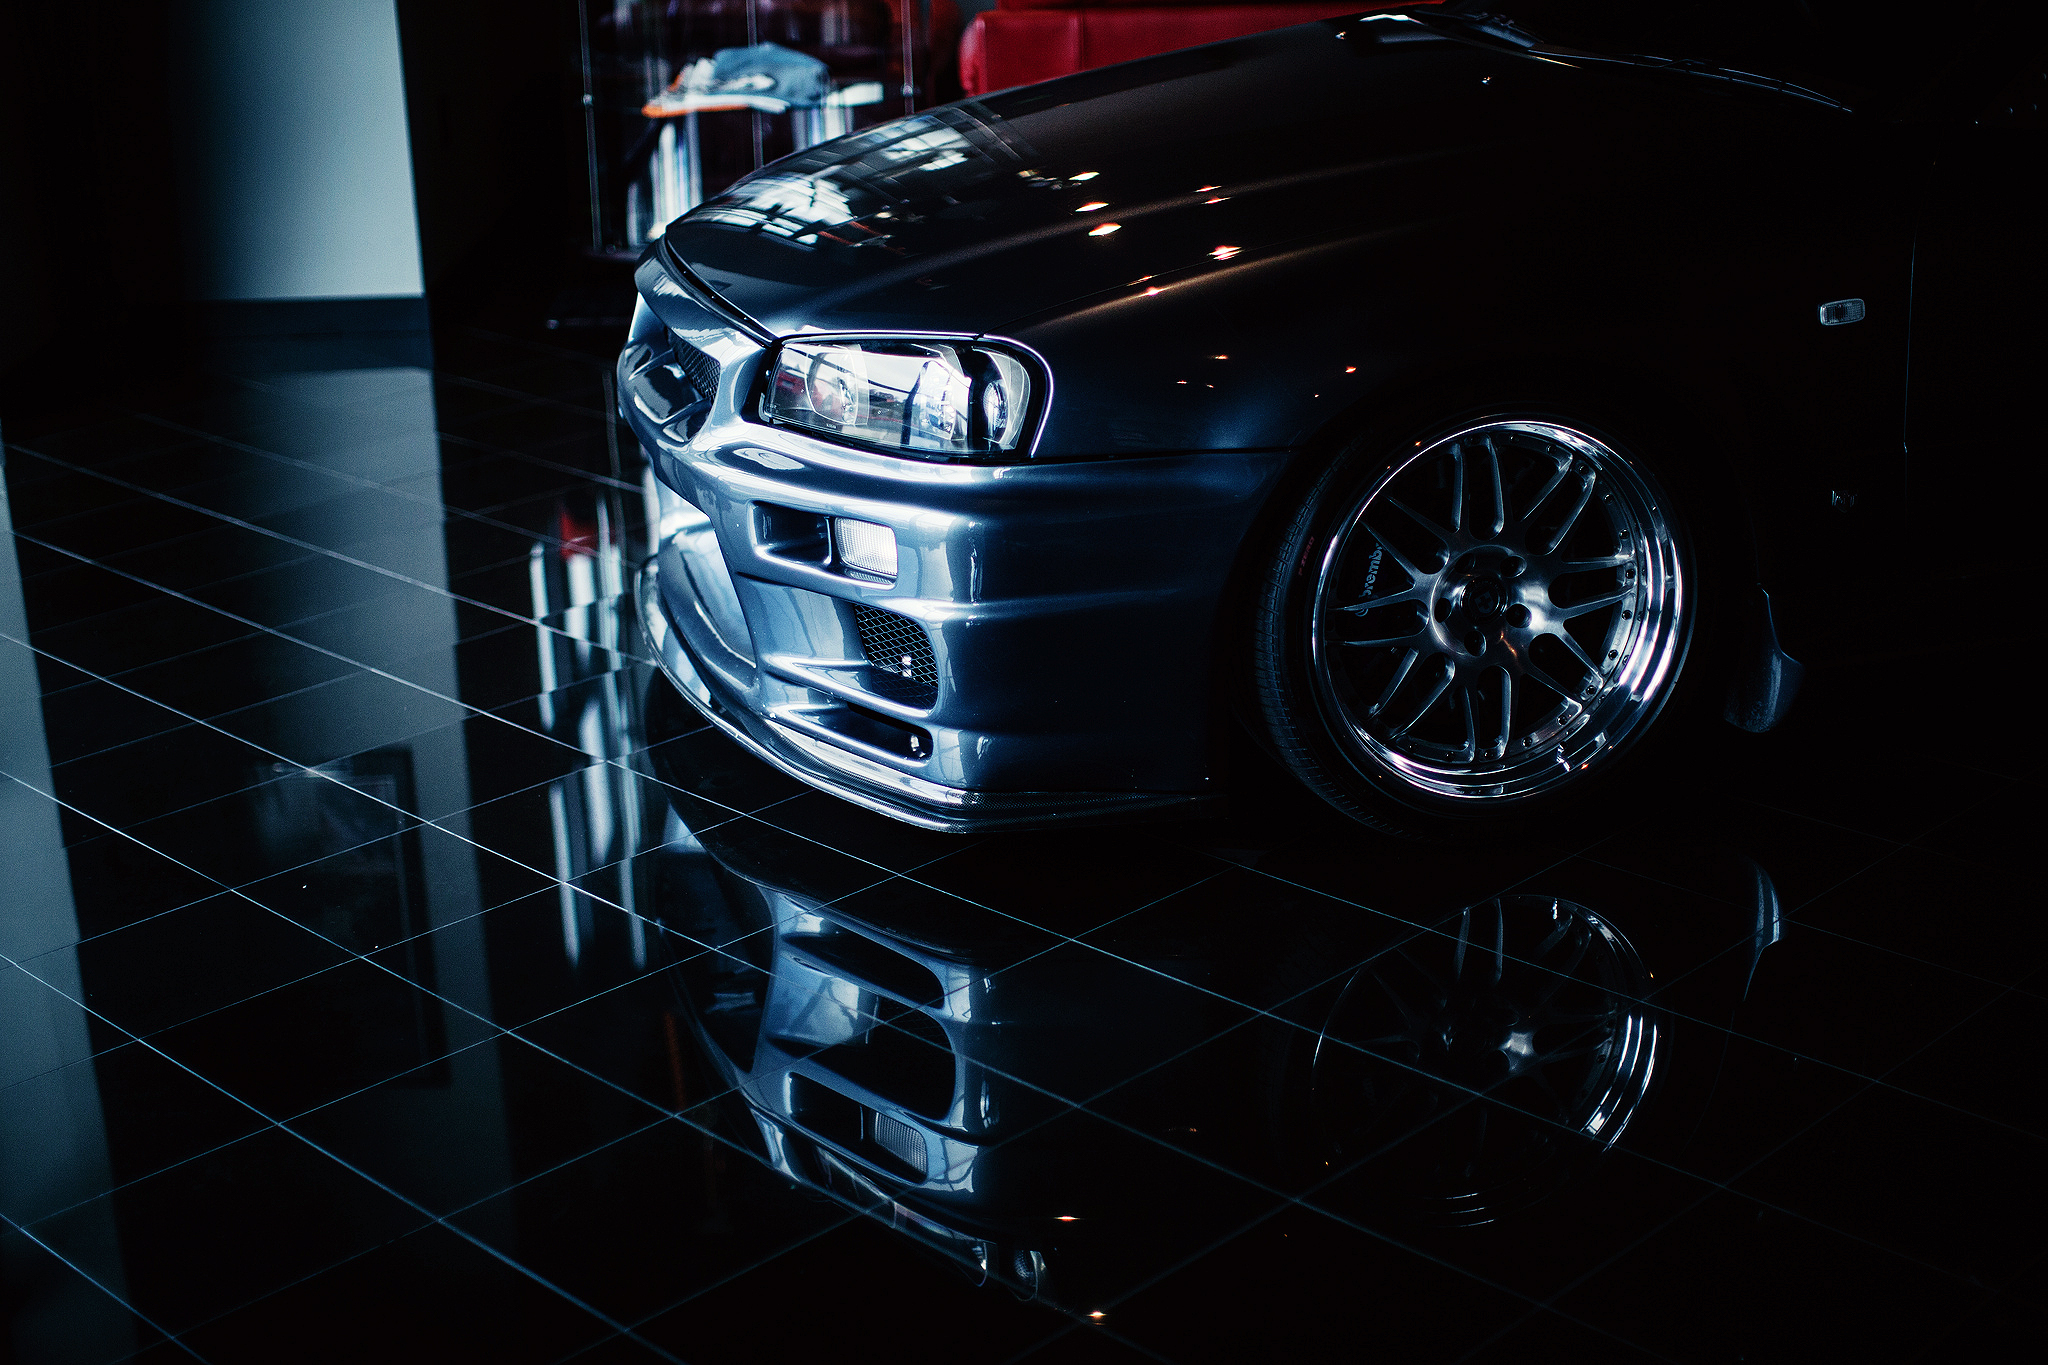 10 Nissan Skyline R34 HD Wallpapers